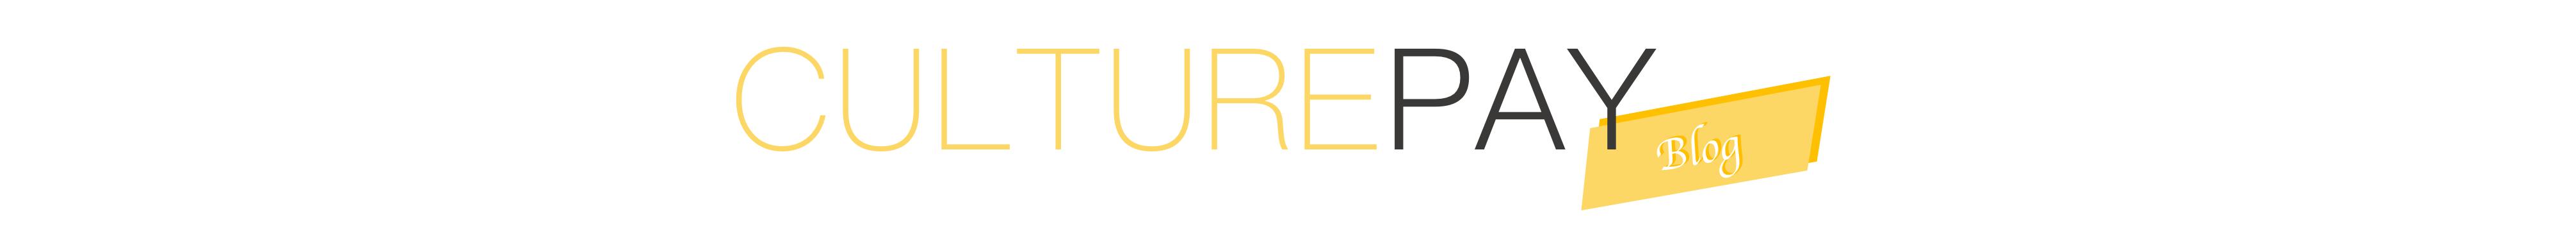 Blog de CulturePay